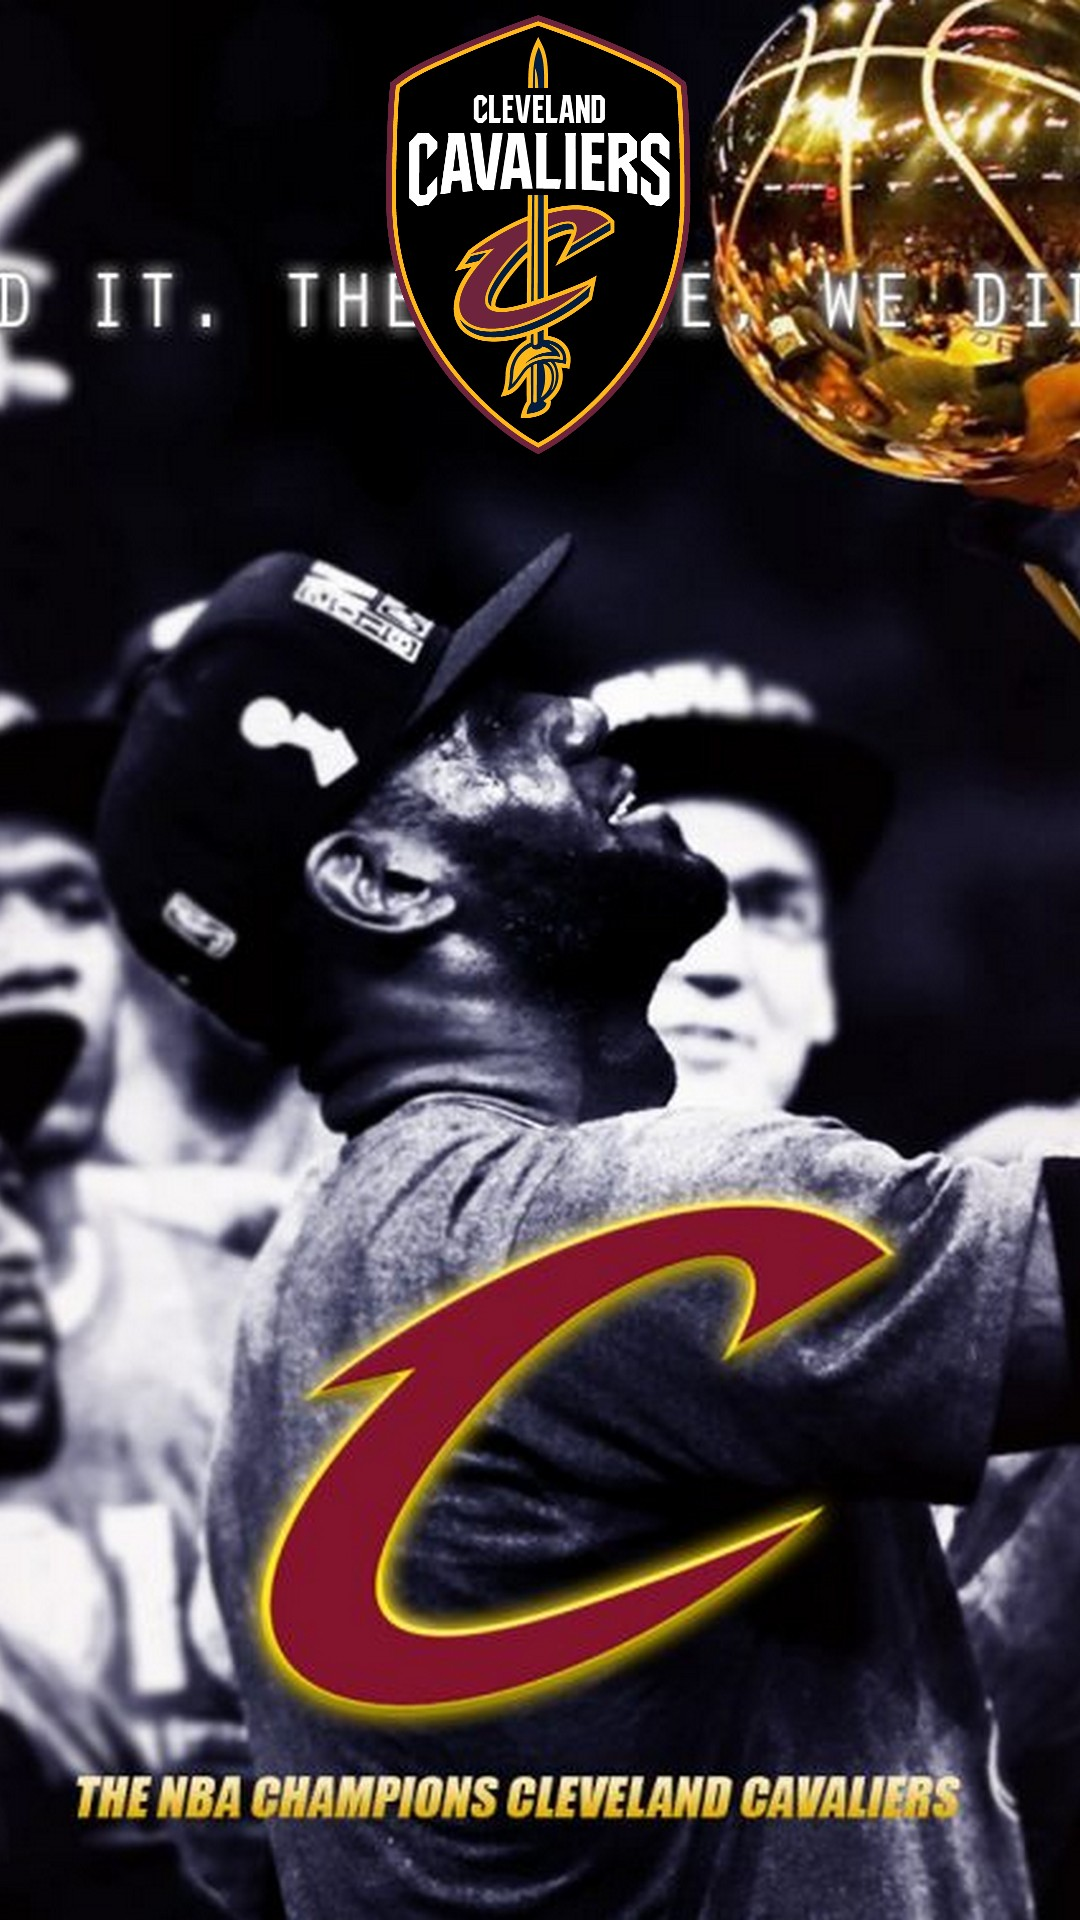 Cleveland Cavaliers NBA Mobile Wallpaper 2020 Basketball Wallpaper 1080x1920